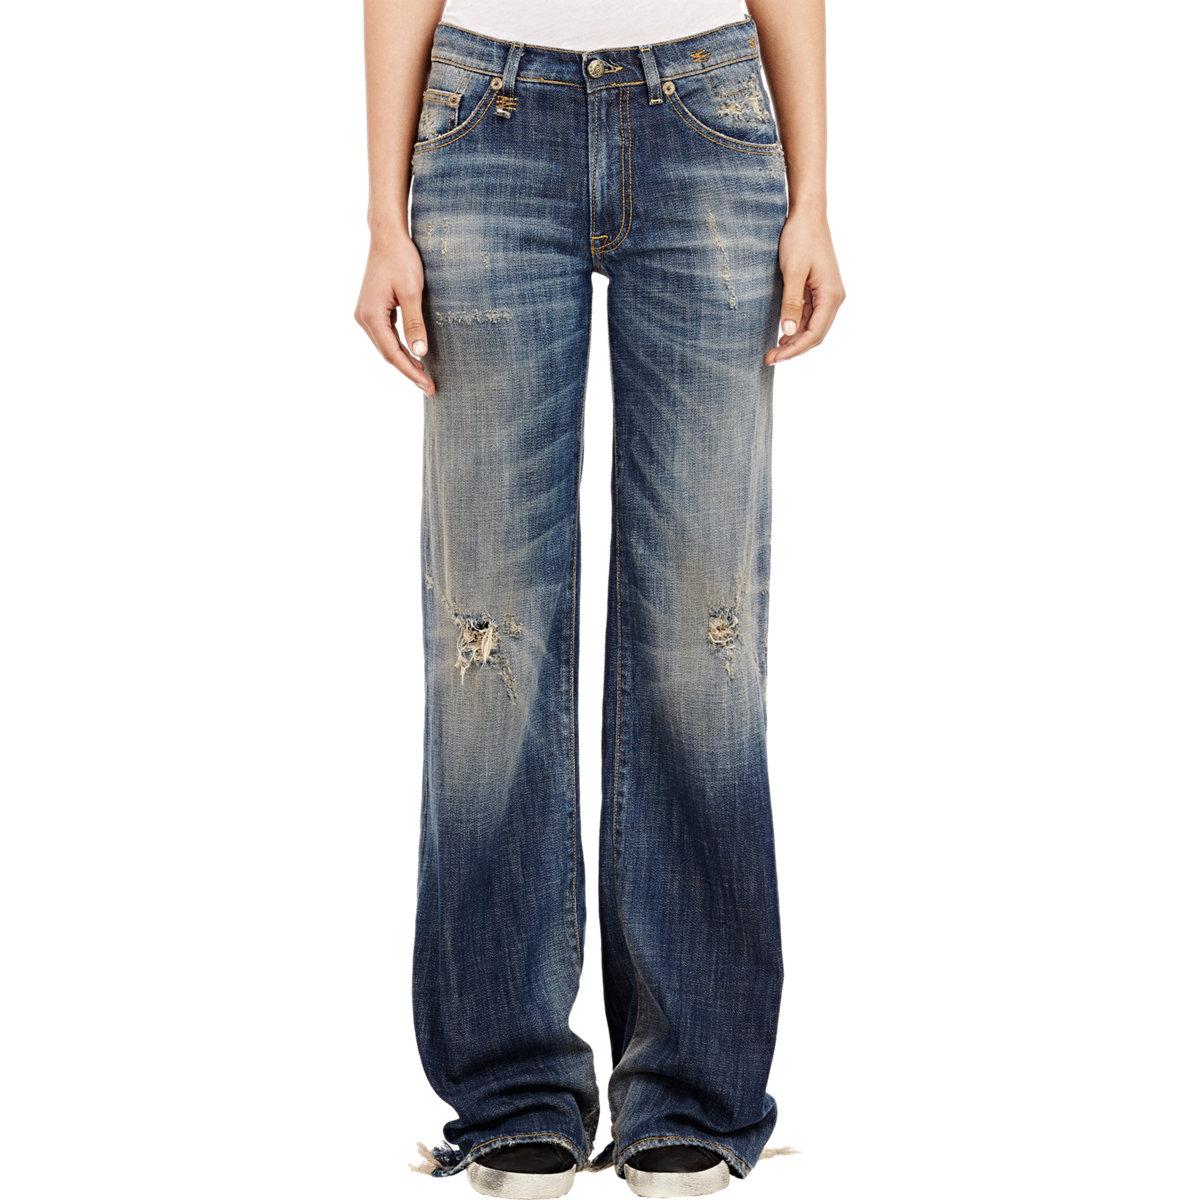 Womens Black True Religion Jeans